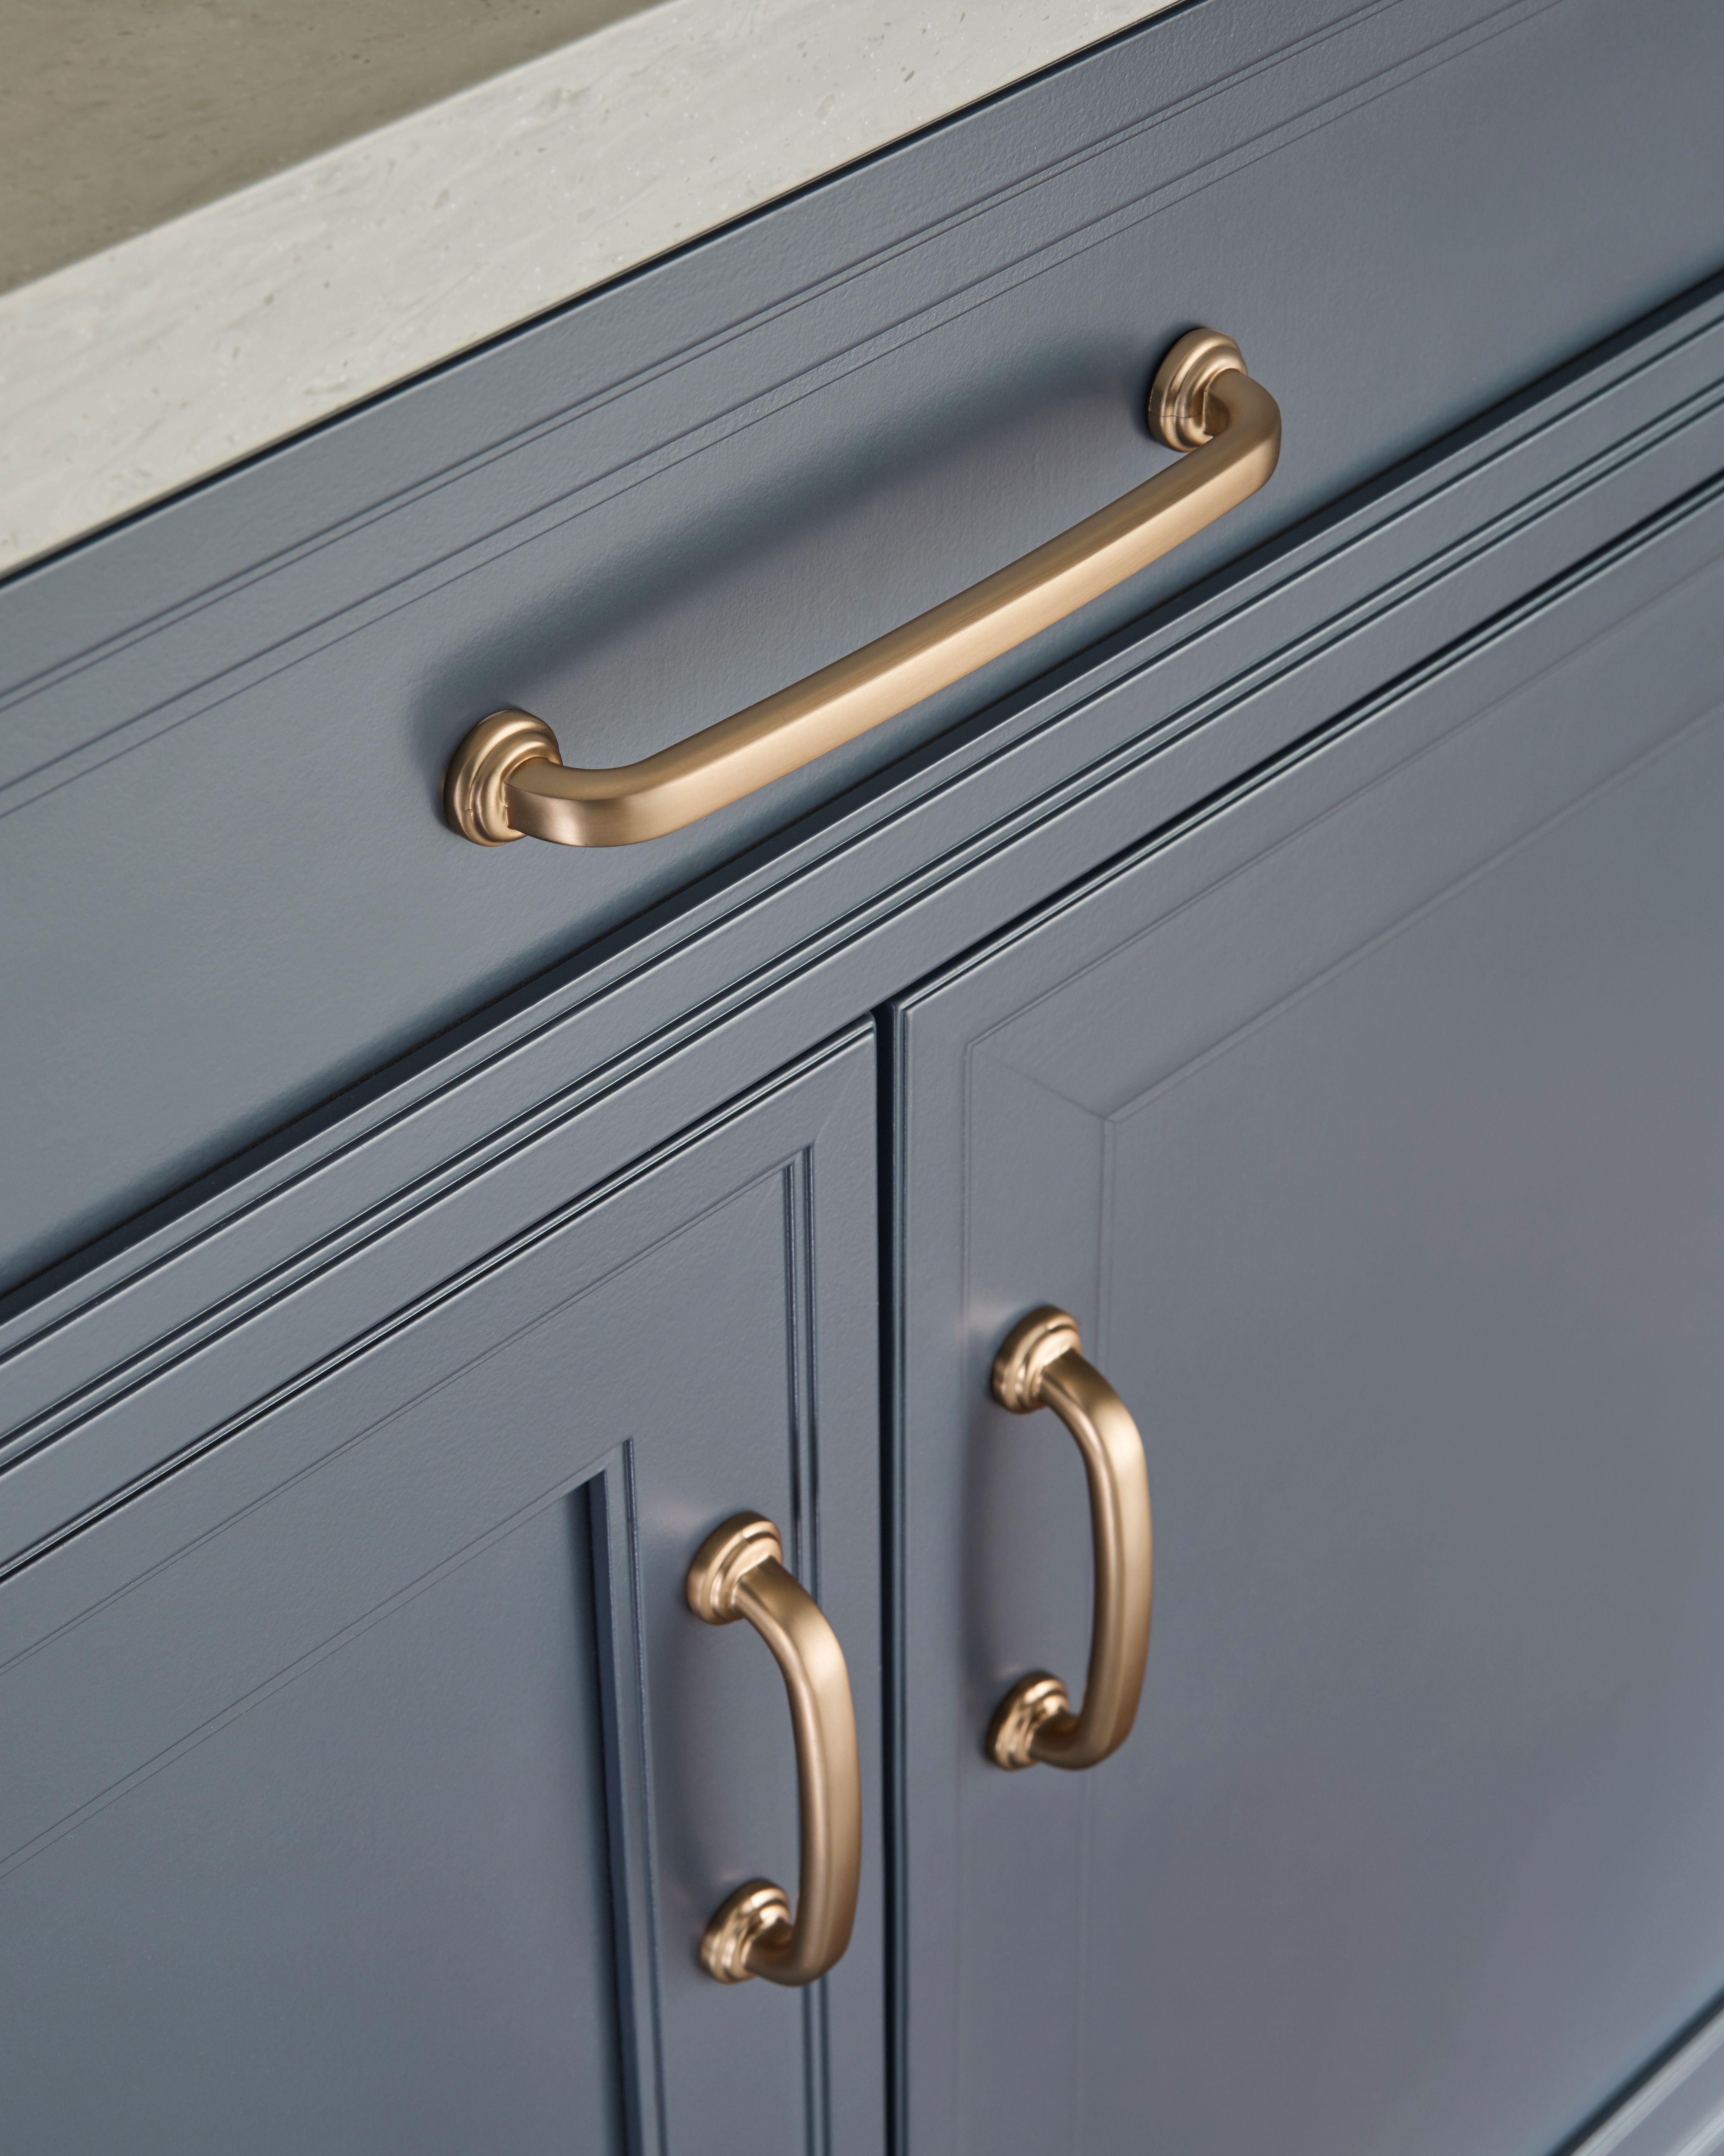 Cabinet Pulls 2 3 4 Inch Center 2021 Cabinet Hardware Makeover Bronze Cabinet Hardware Cabinet Hardware Bronze [ 5223 x 4176 Pixel ]